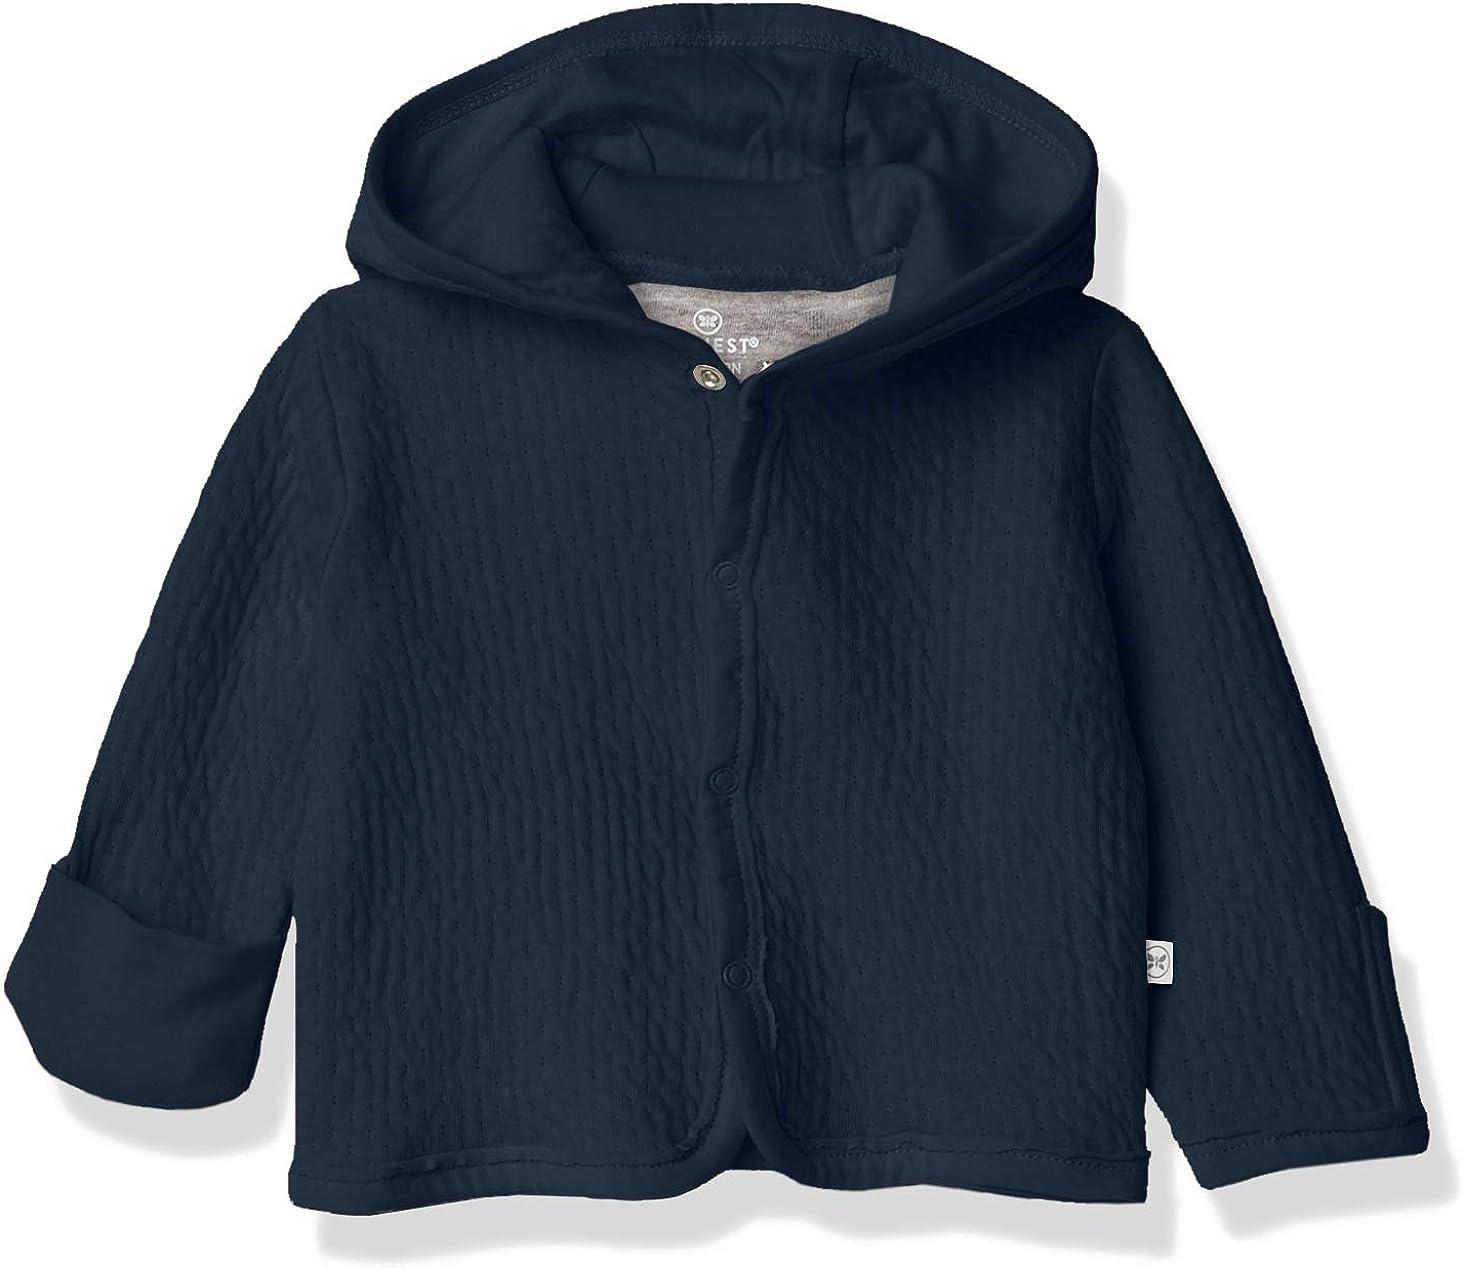 HonestBaby Organic Cotton Matelasse Snap-Front Hooded Jacket, Dark Navy, 0-3 Months